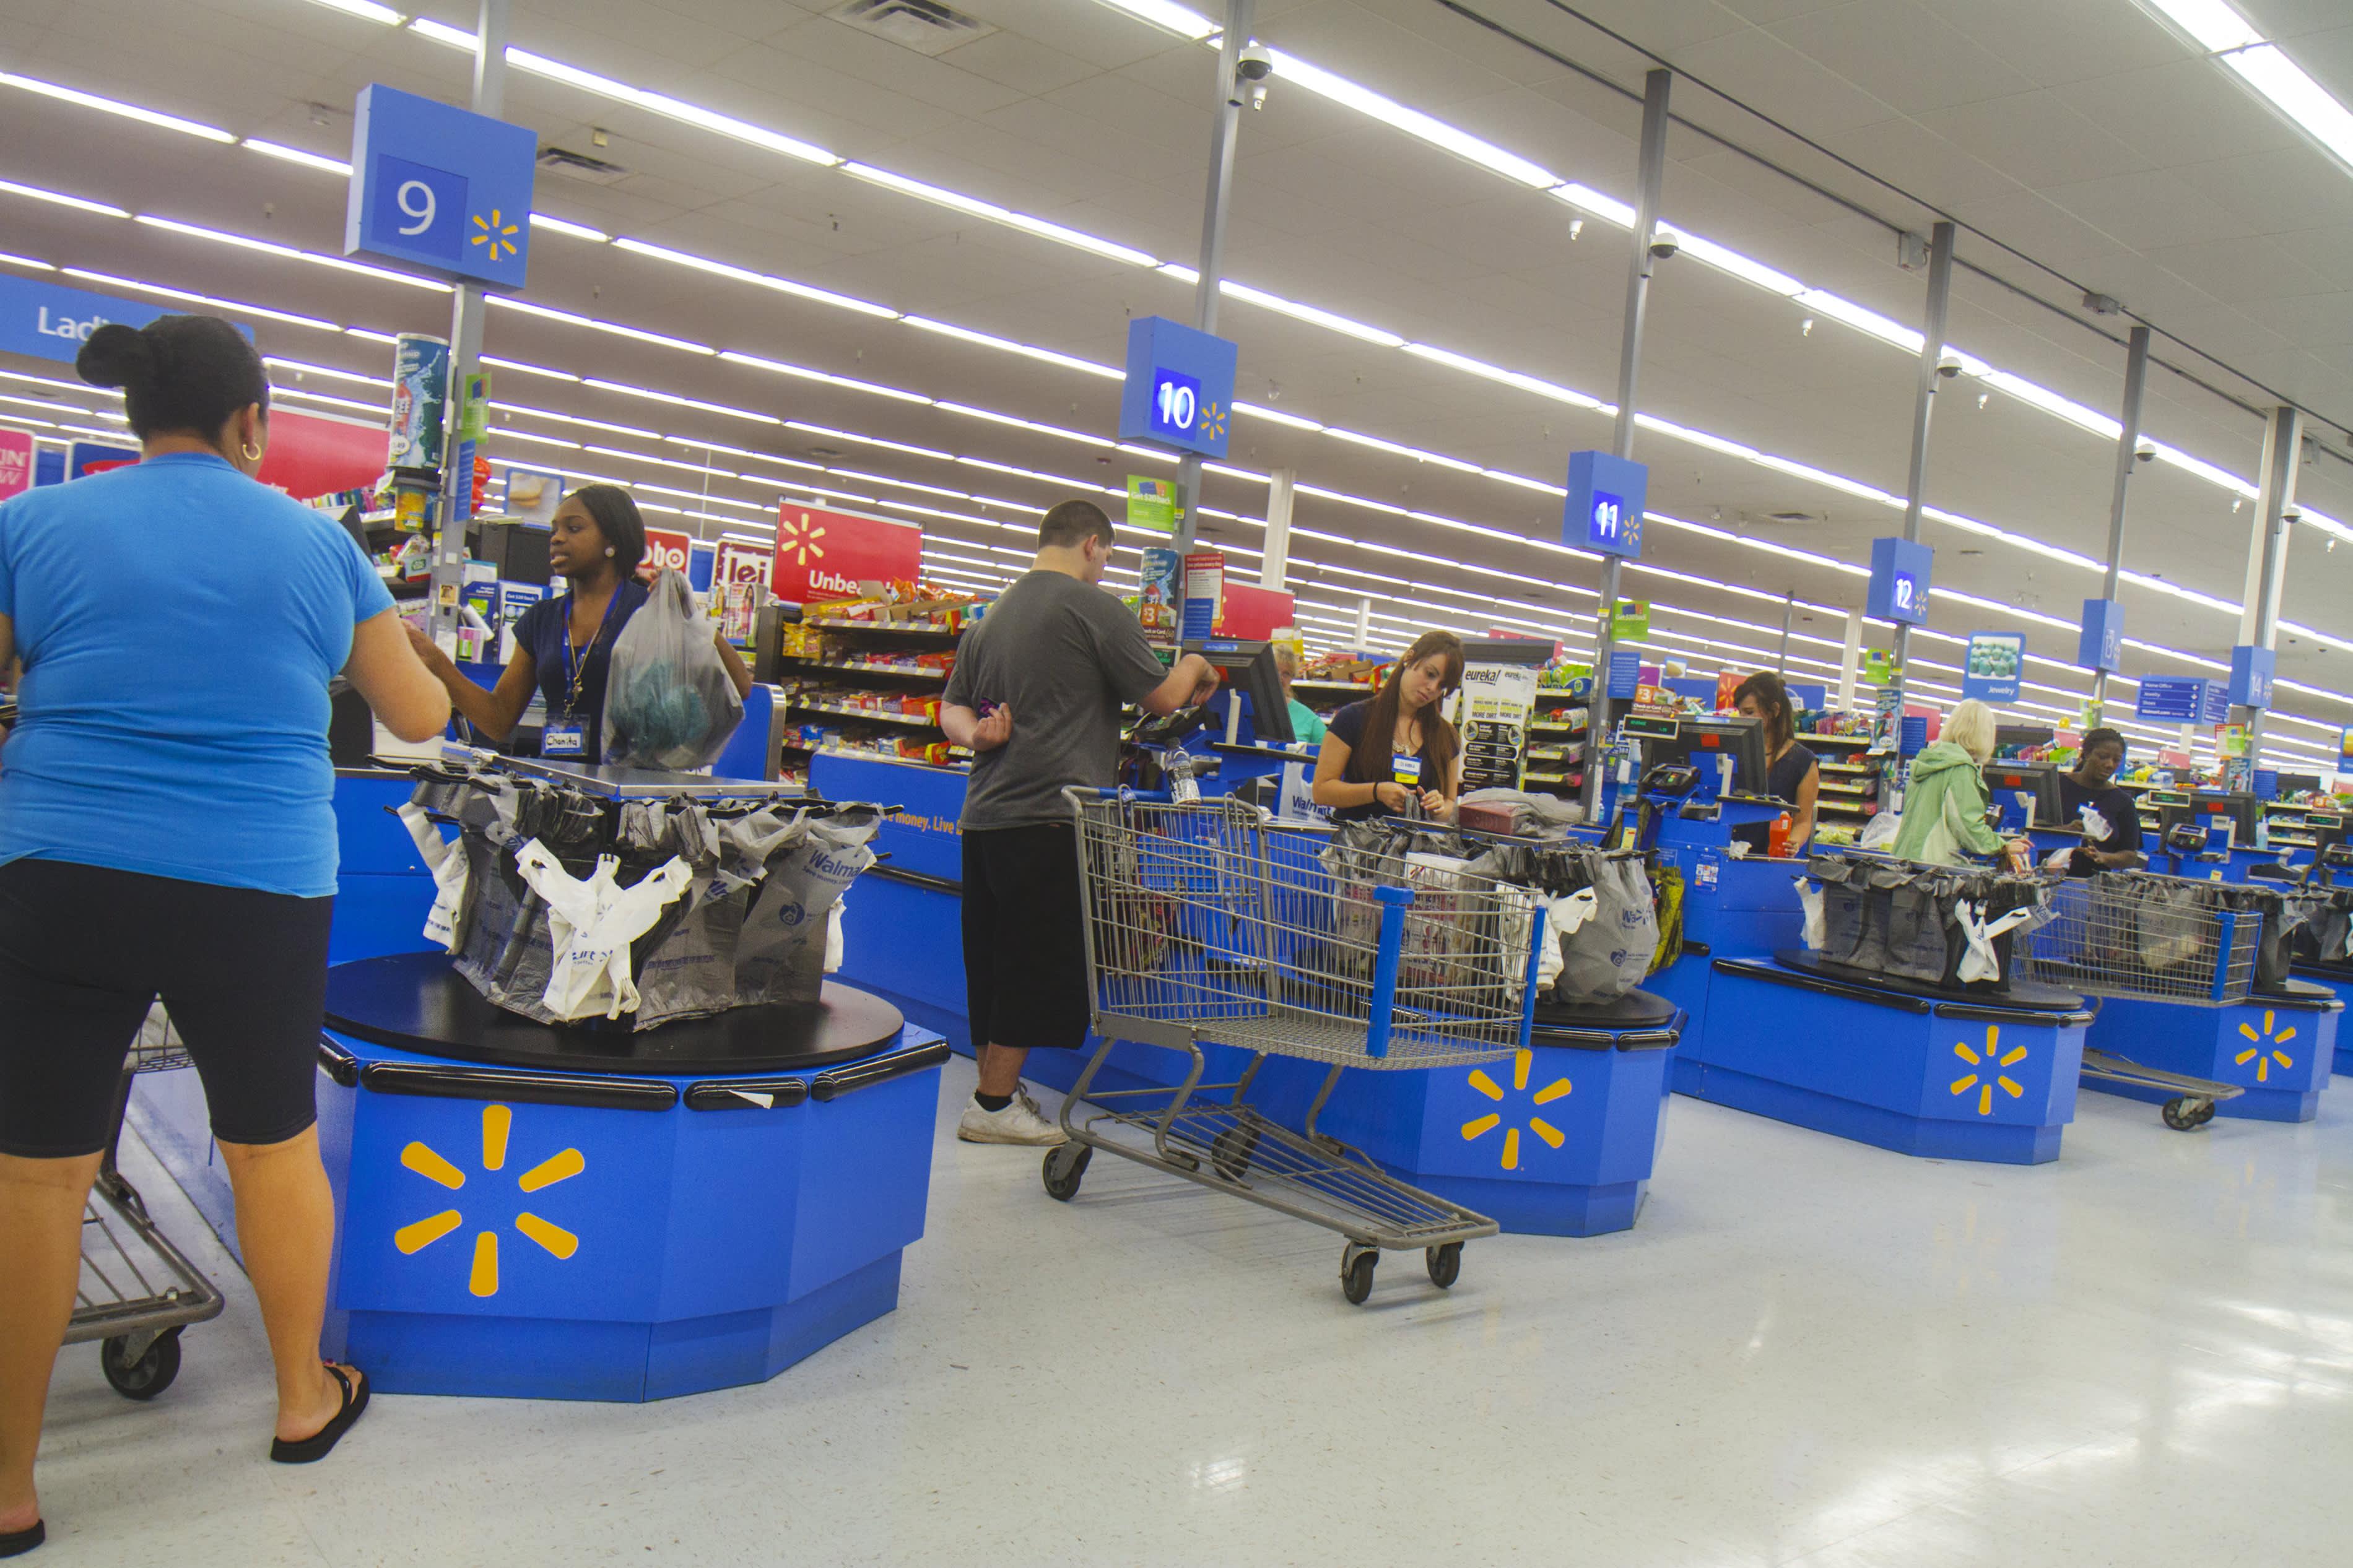 Walmart nimble, thinks like a digital company: Analyst